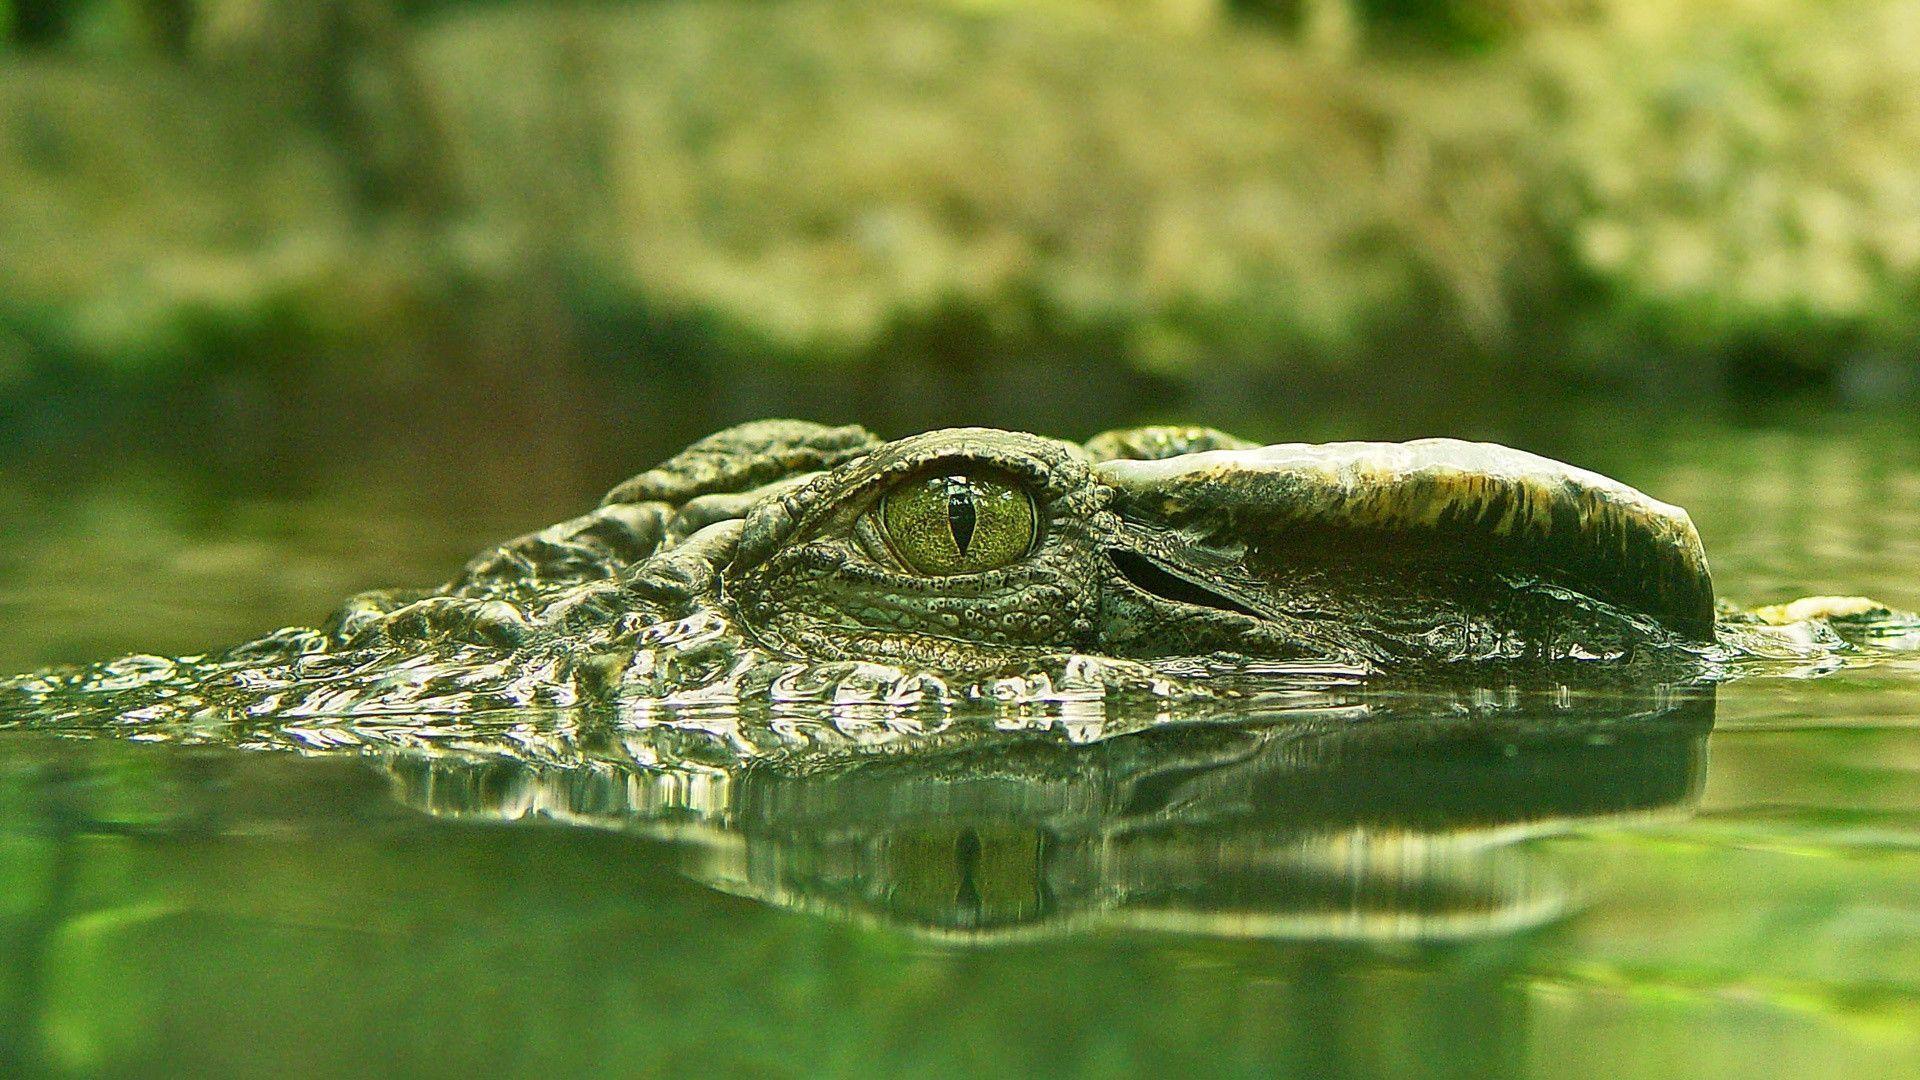 Crocodile Wallpapers - Wallpaper Cave